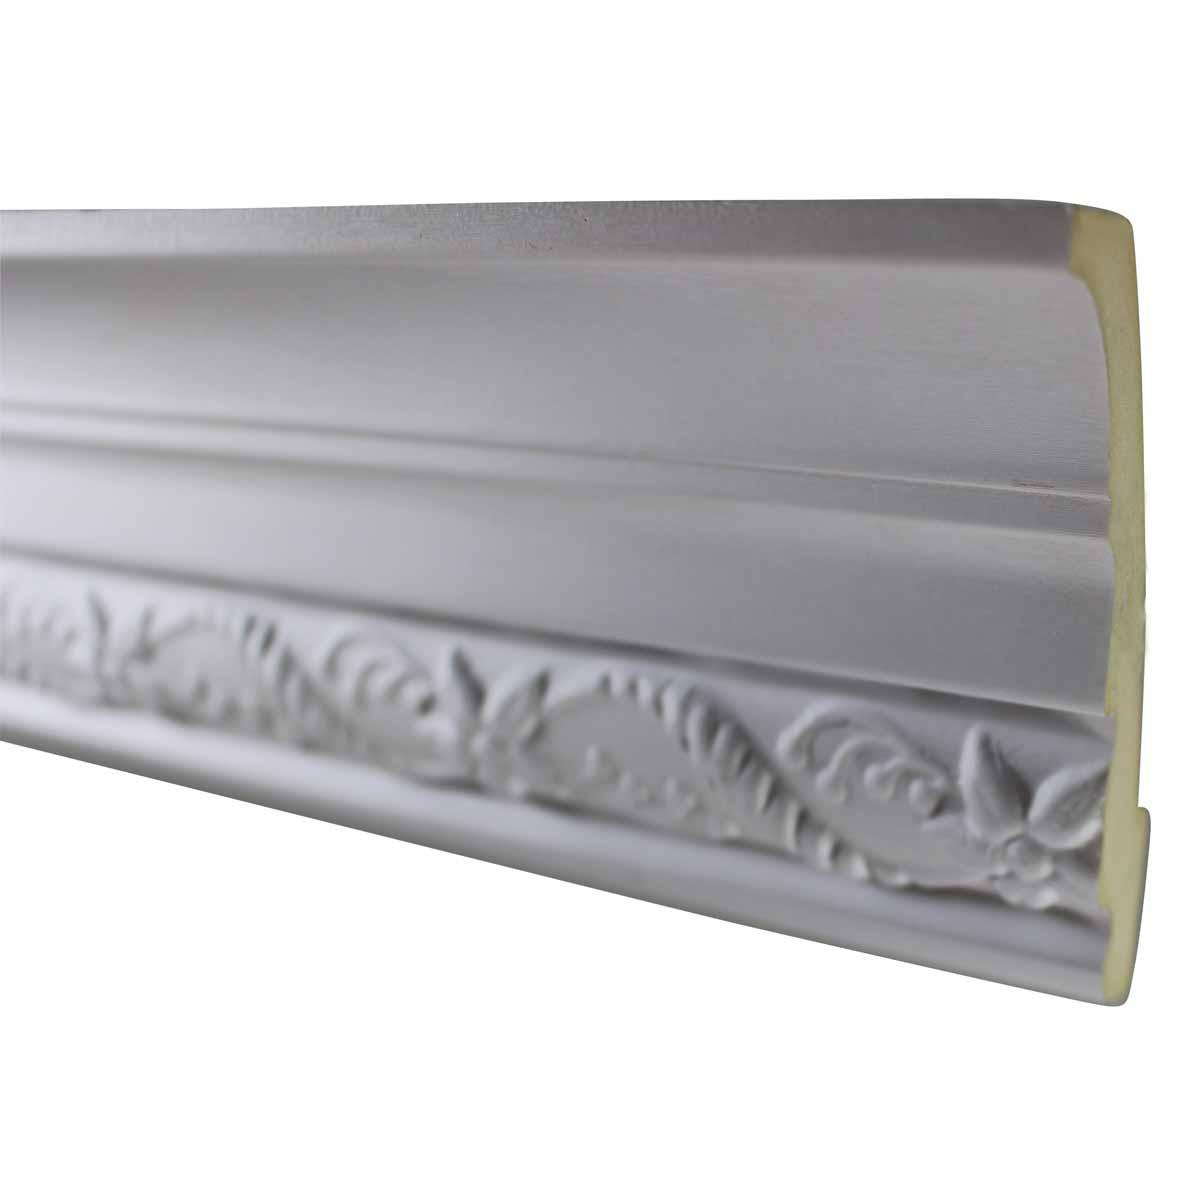 Cornice White Urethane Sample of 10508 23.25 Long Cornice Cornice Moulding Cornice Molding